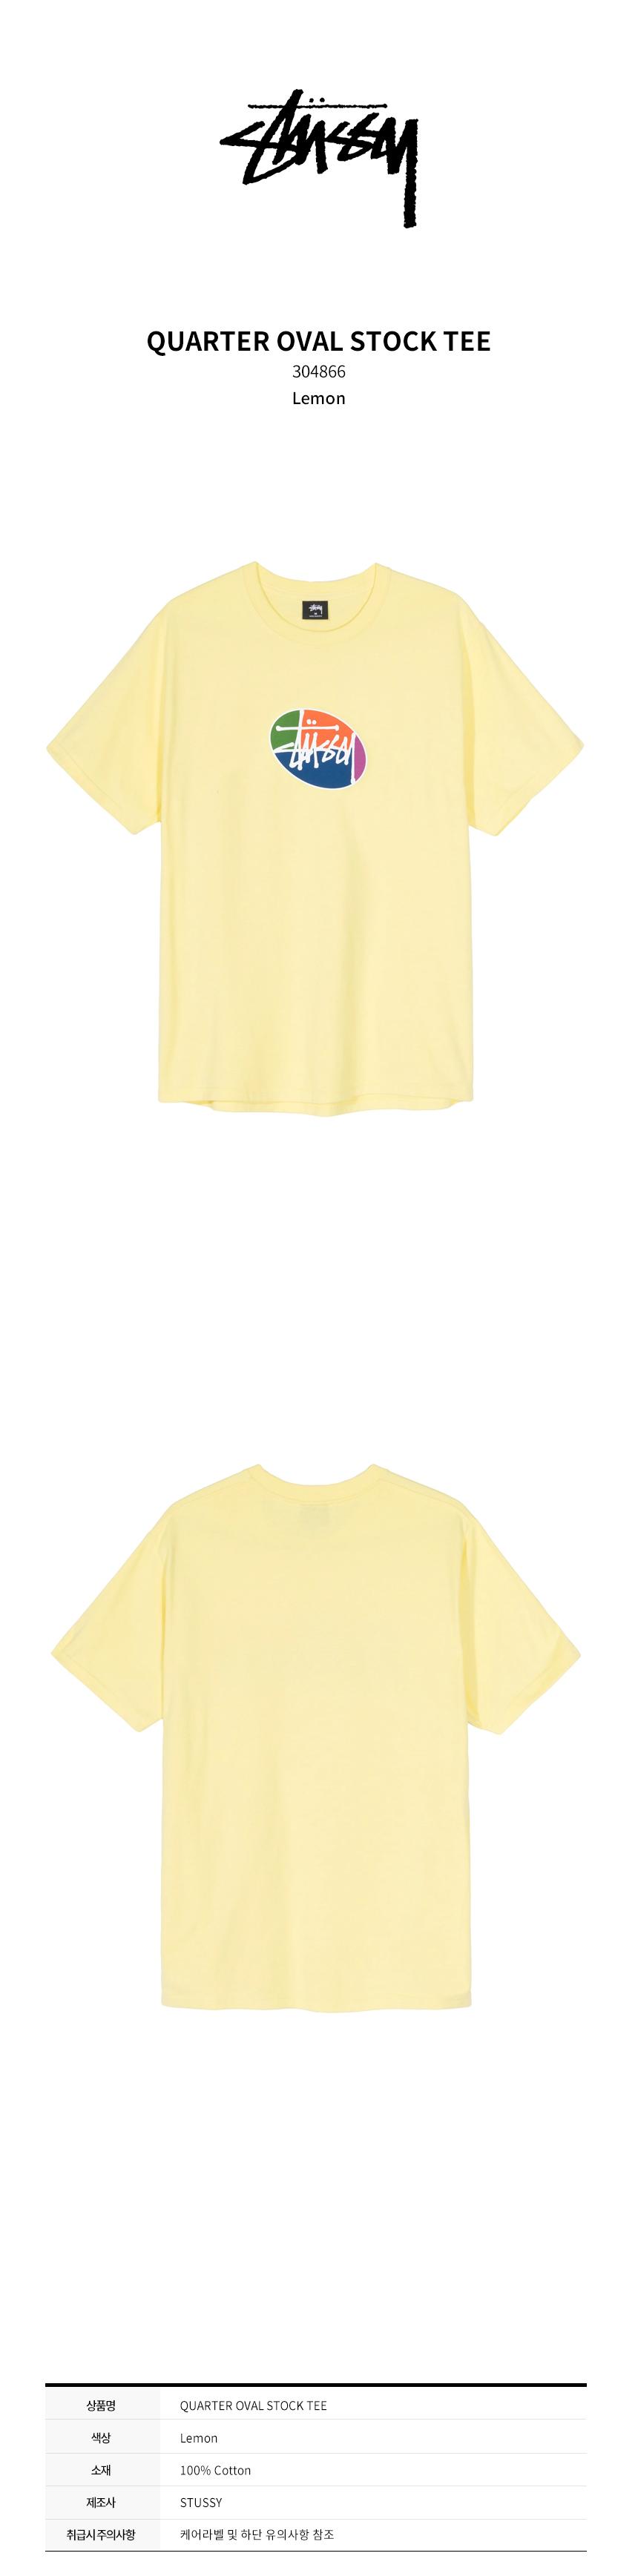 304866_lemon.jpg